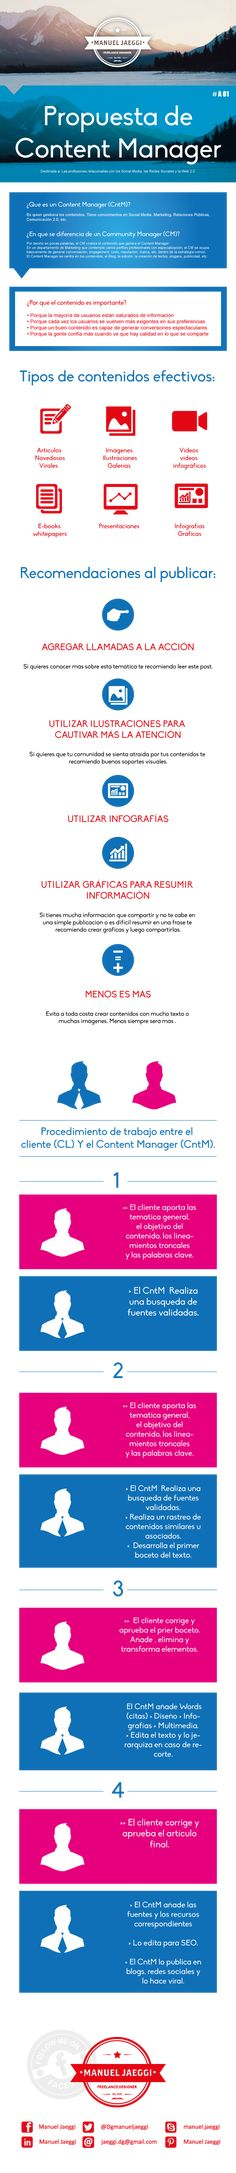 Qué es y qué hace un Content Manager #infografia #infographic #marketing